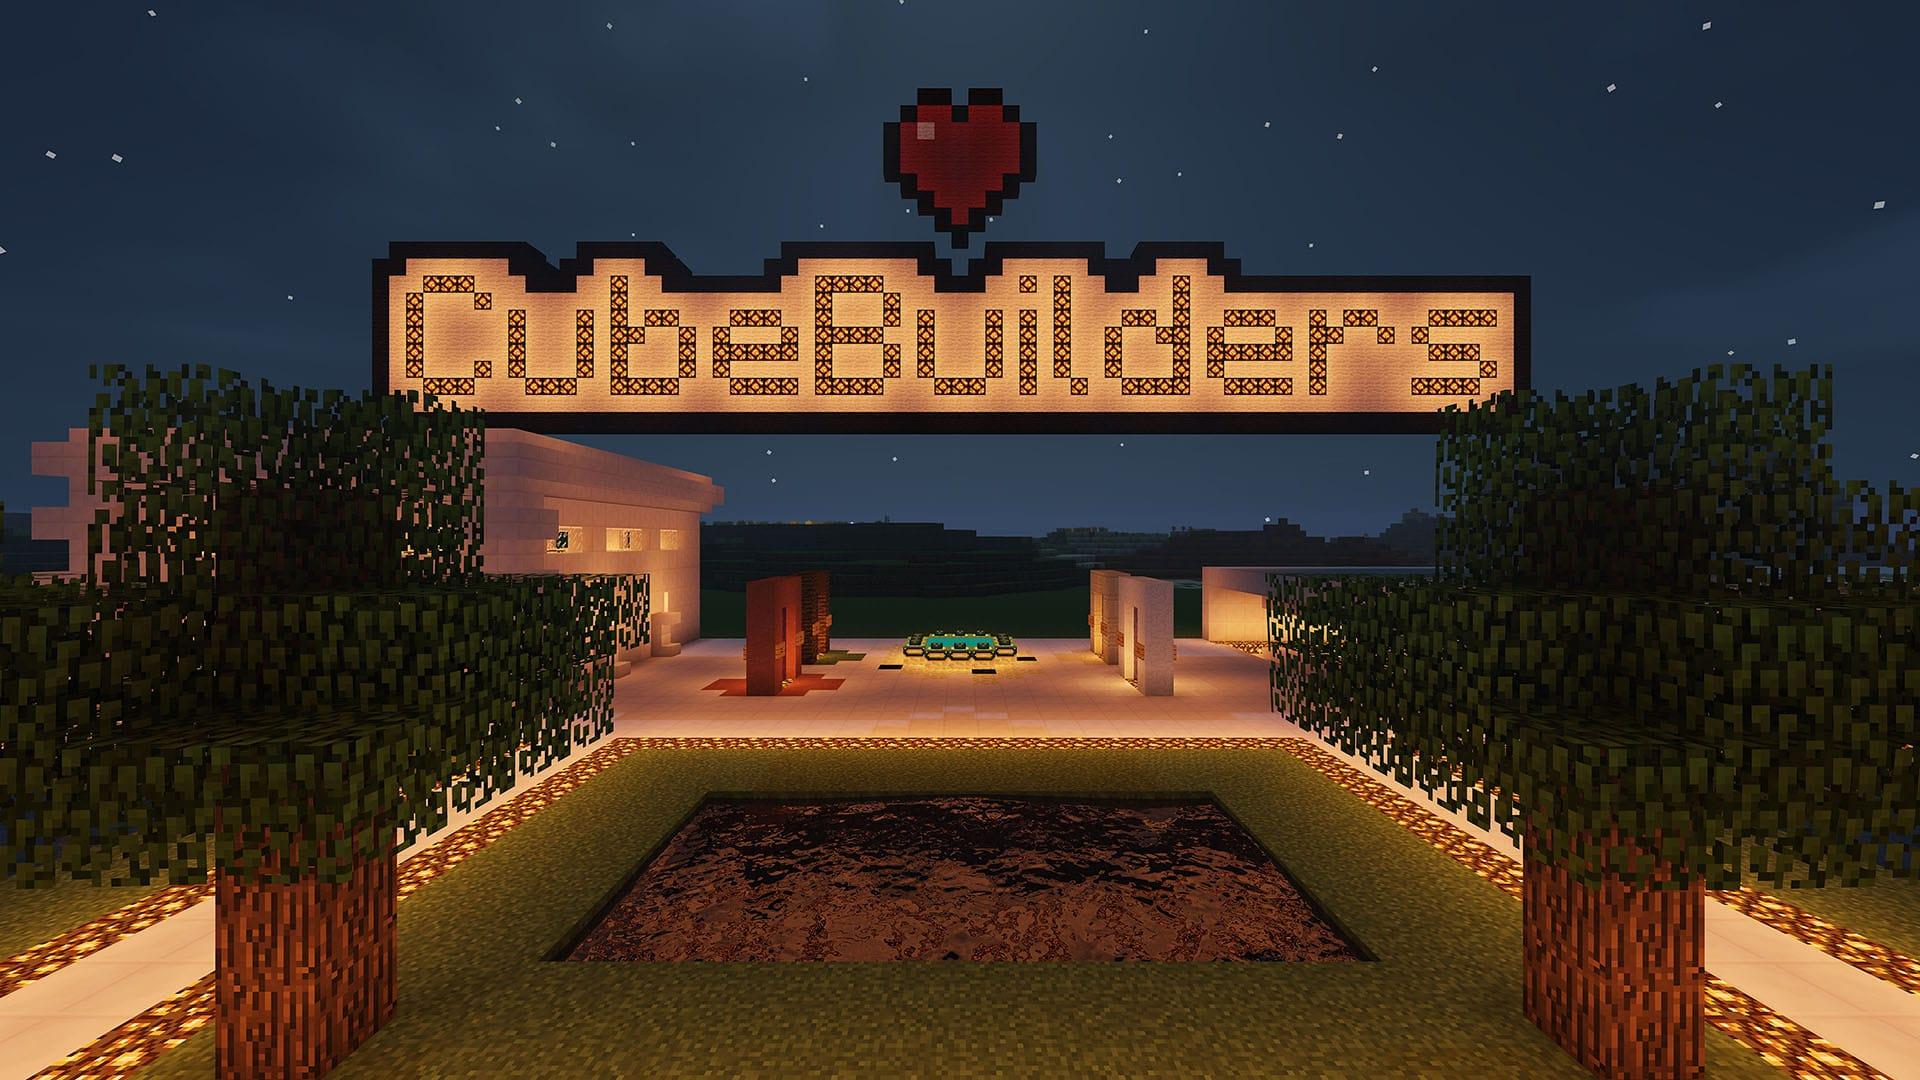 CubeBuilders